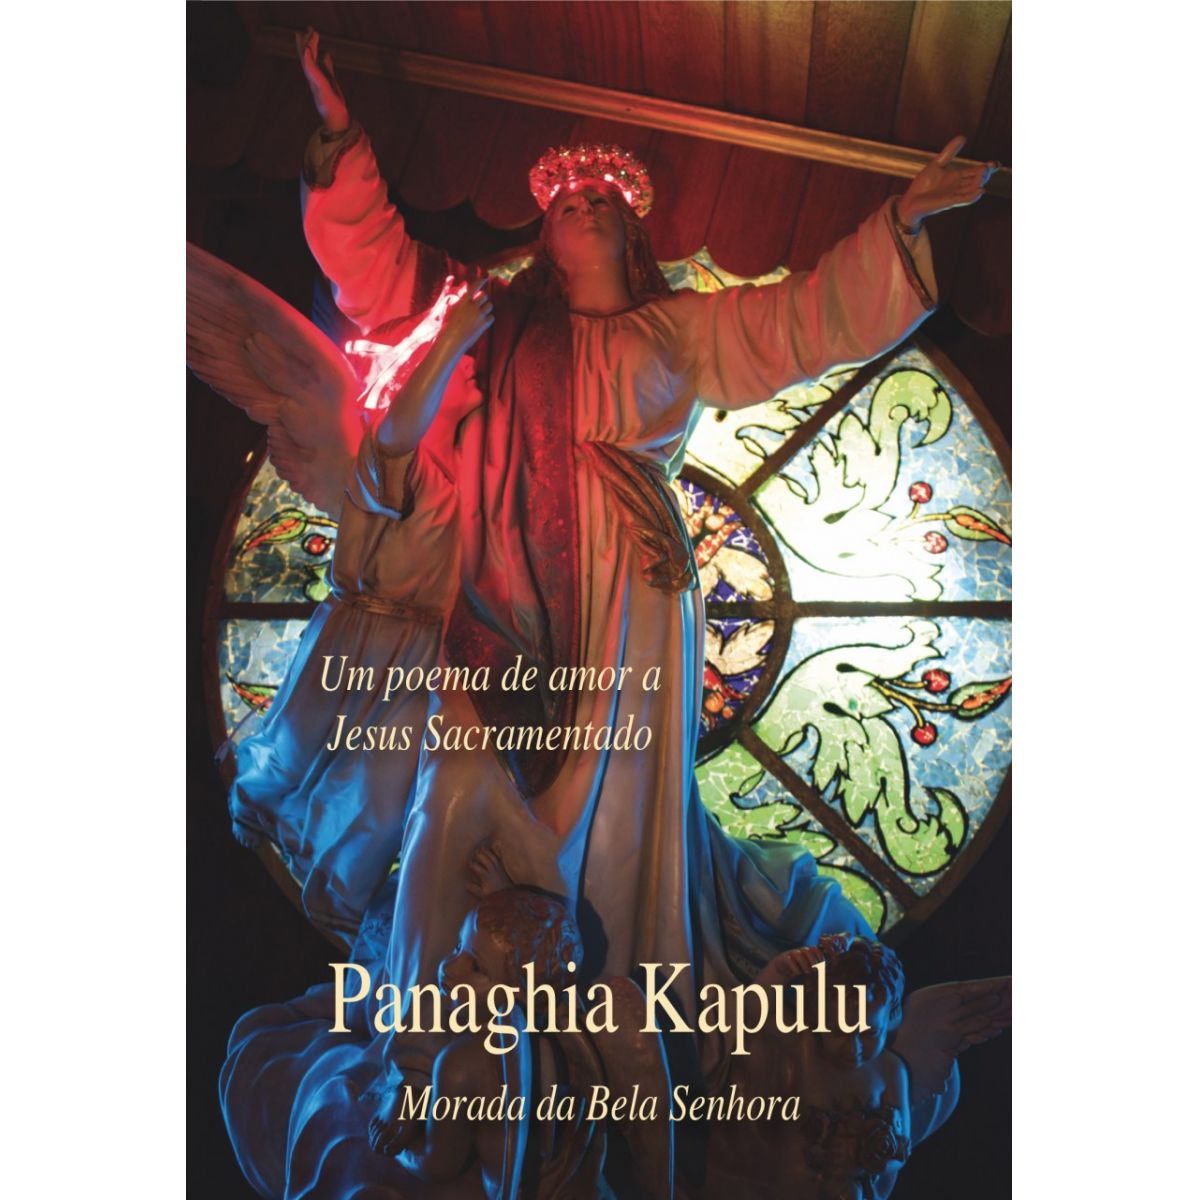 Panaghia Kapulu